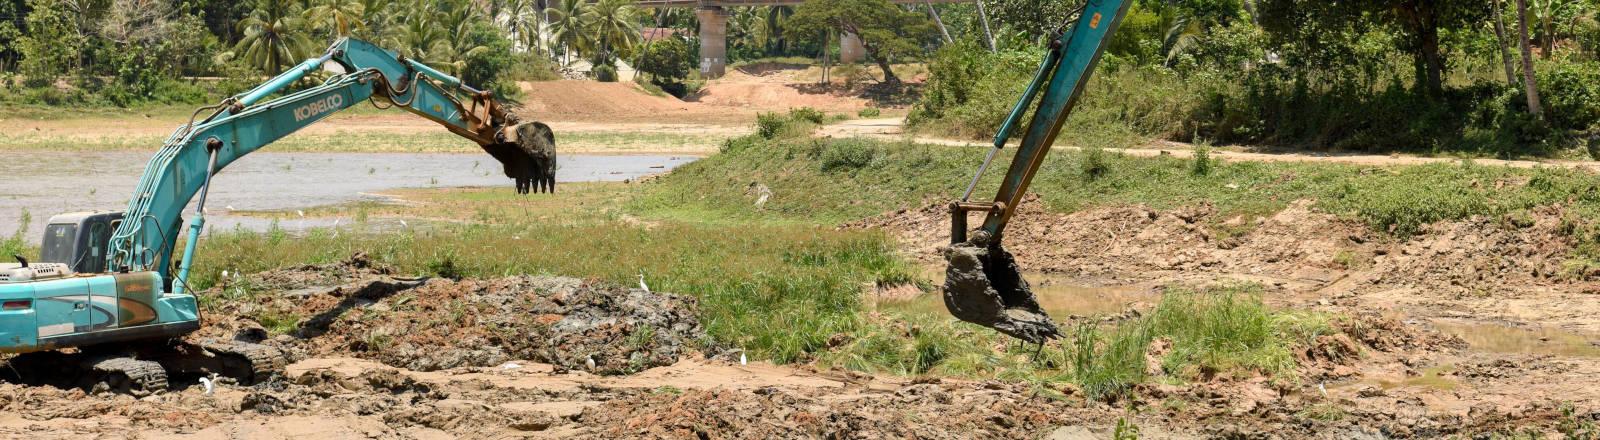 Zwei Bagger graben Erde aus